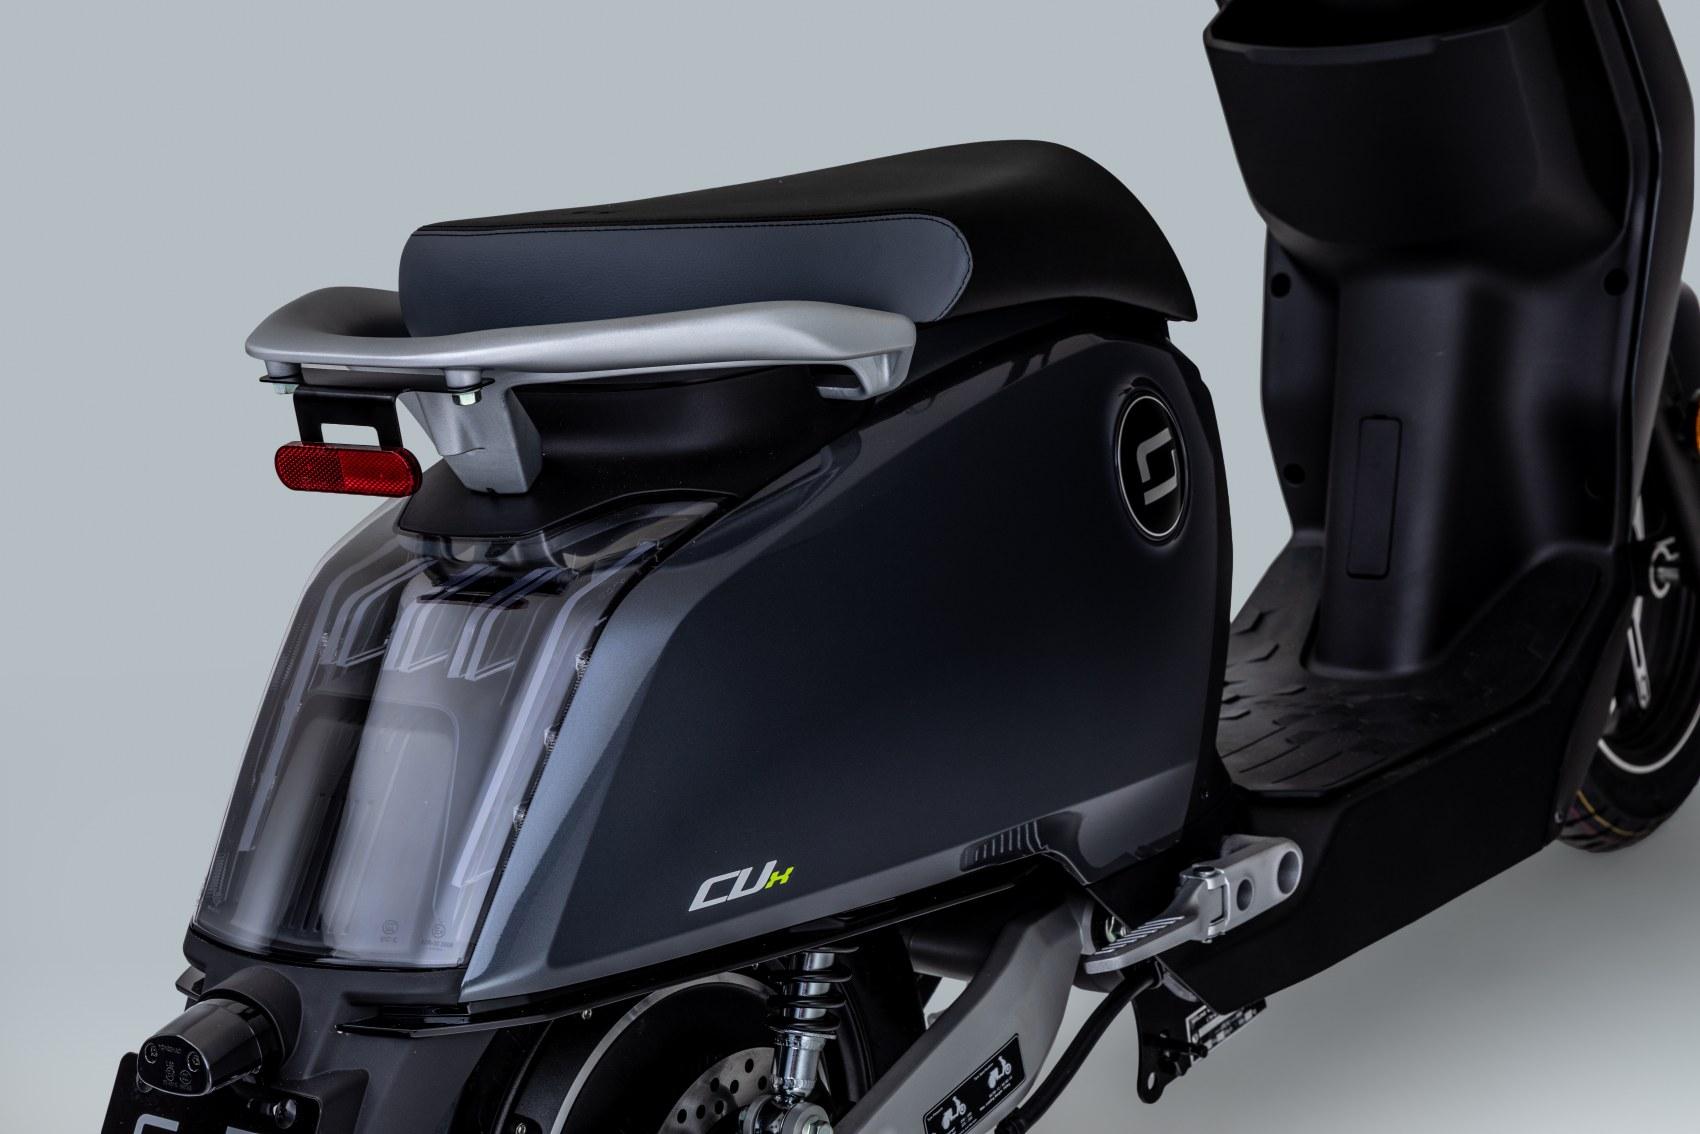 Super Soco CUx electric scooter rear